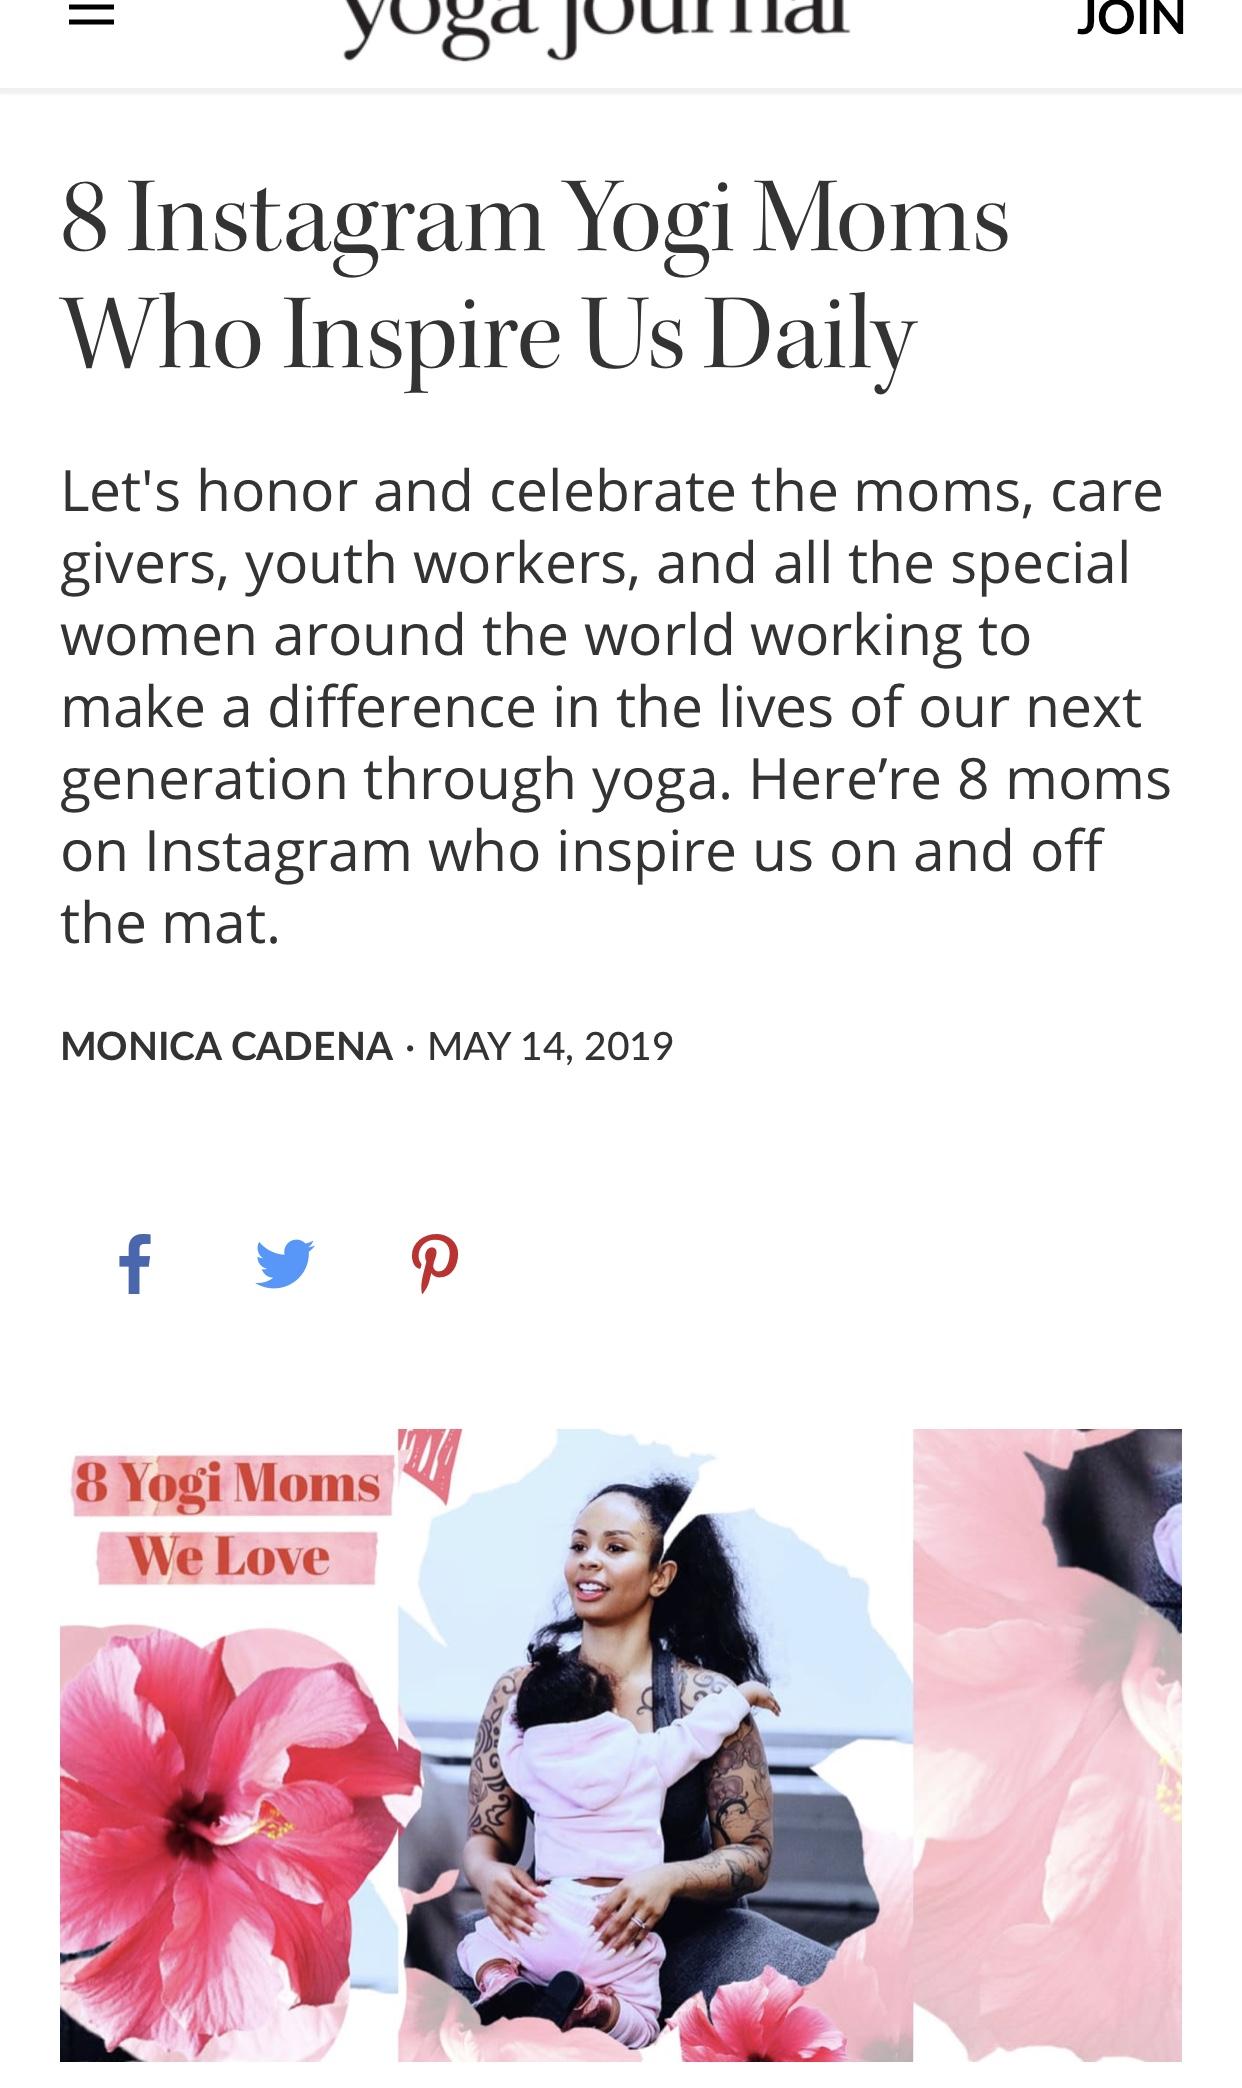 Yoga Journal - Yogi Moms Who Inspire us Daily